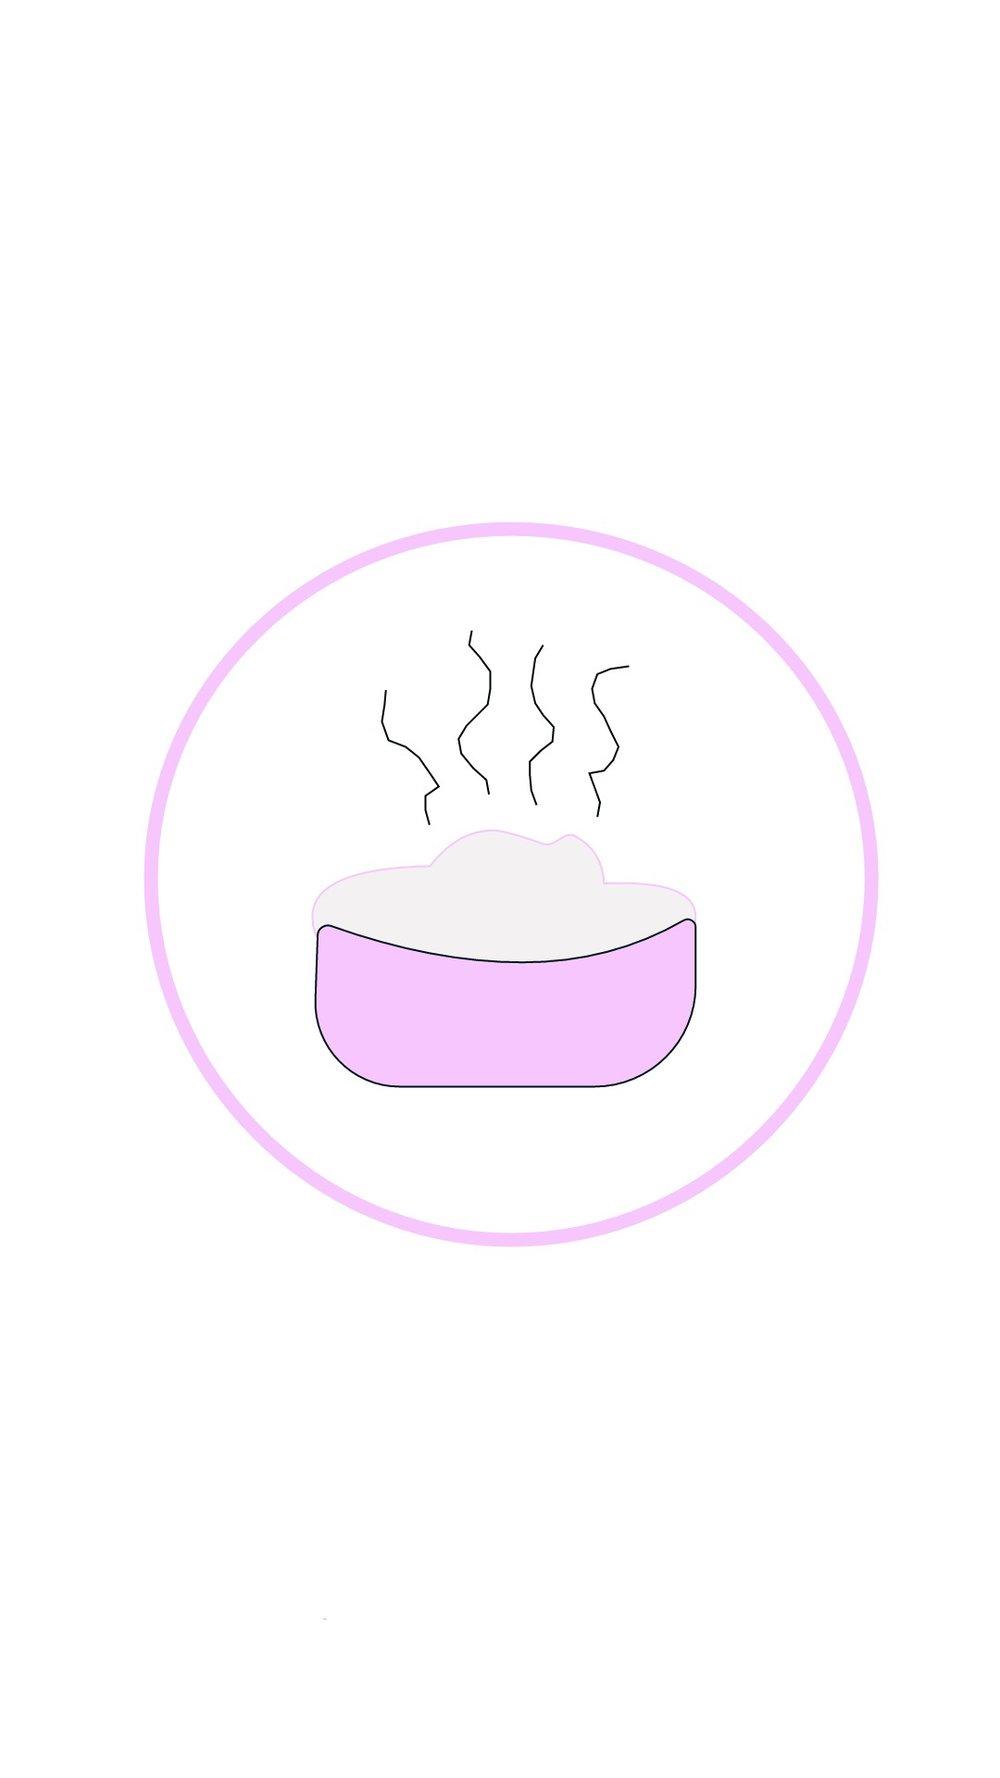 Instagram-cover-baby-girl-food-pink-lotnotes.com.jpg